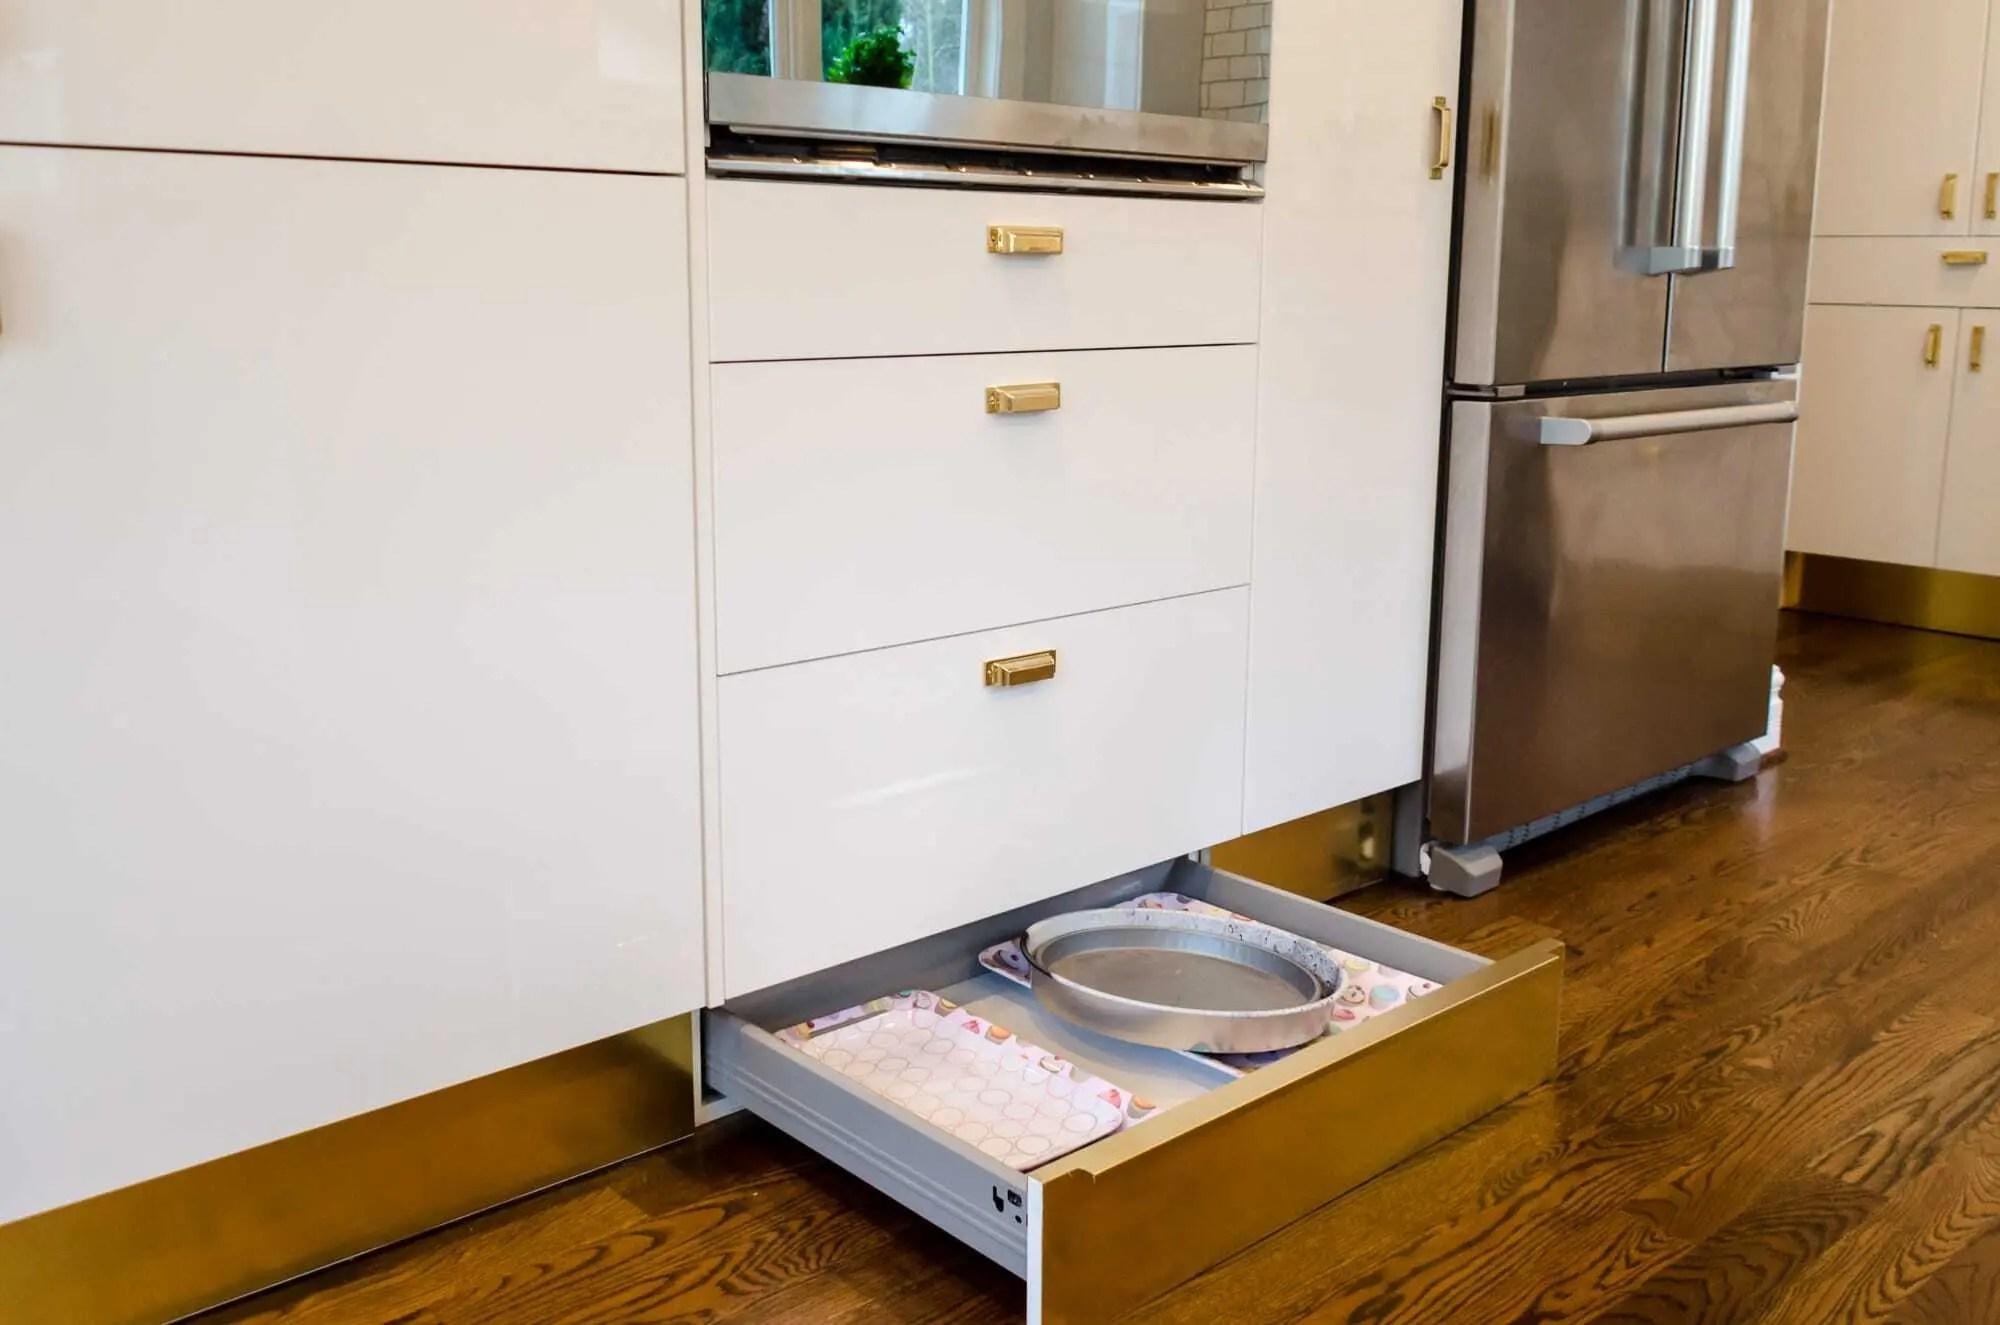 ikea hacks kitchen cabinet drawers Drawer IKEA Hack